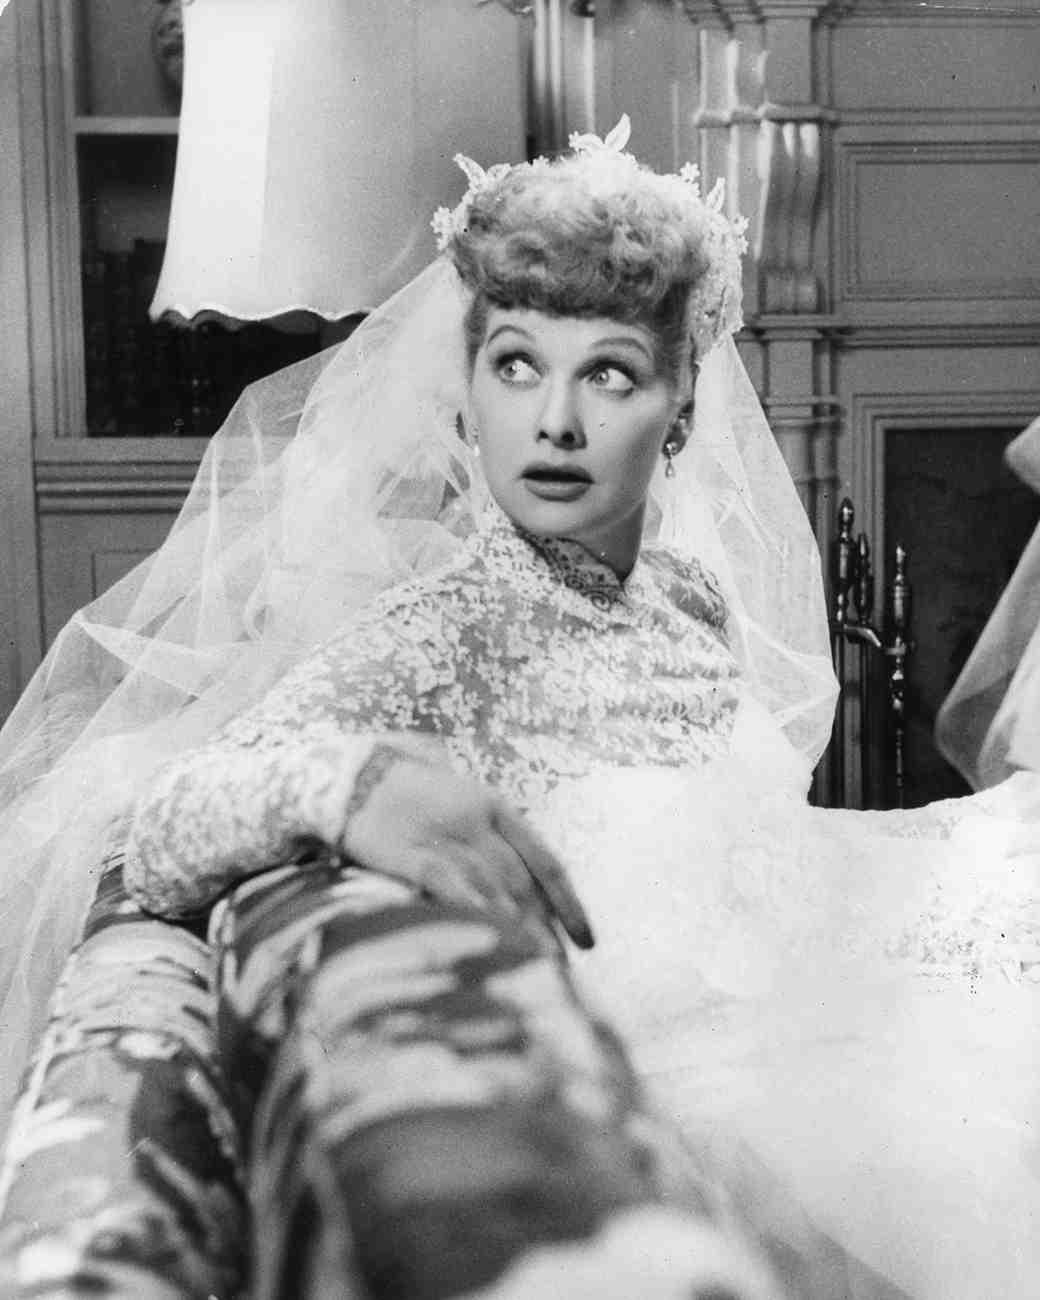 movie-wedding-dresses-the-long-long-trailer-lucille-ball-0316.jpg